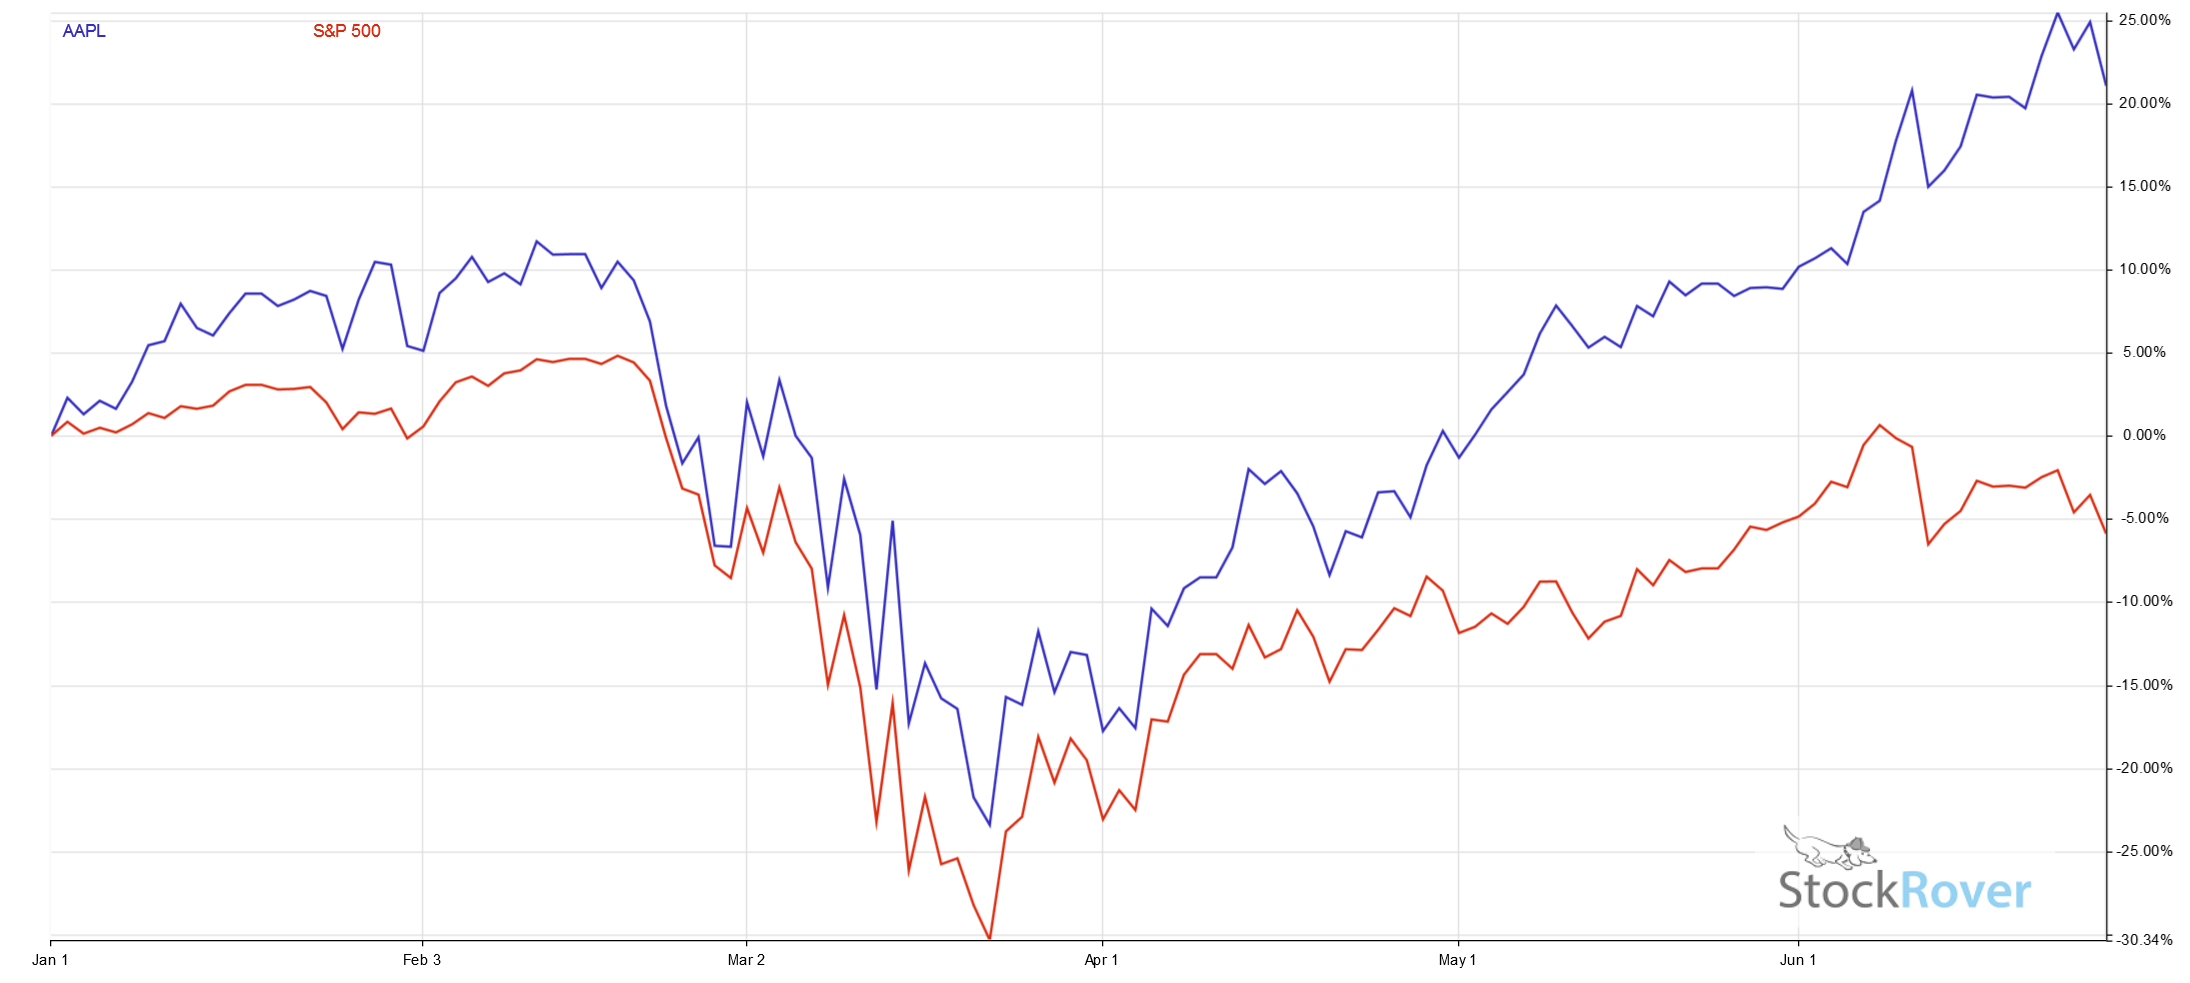 AAPL SP500 Correlation Chart